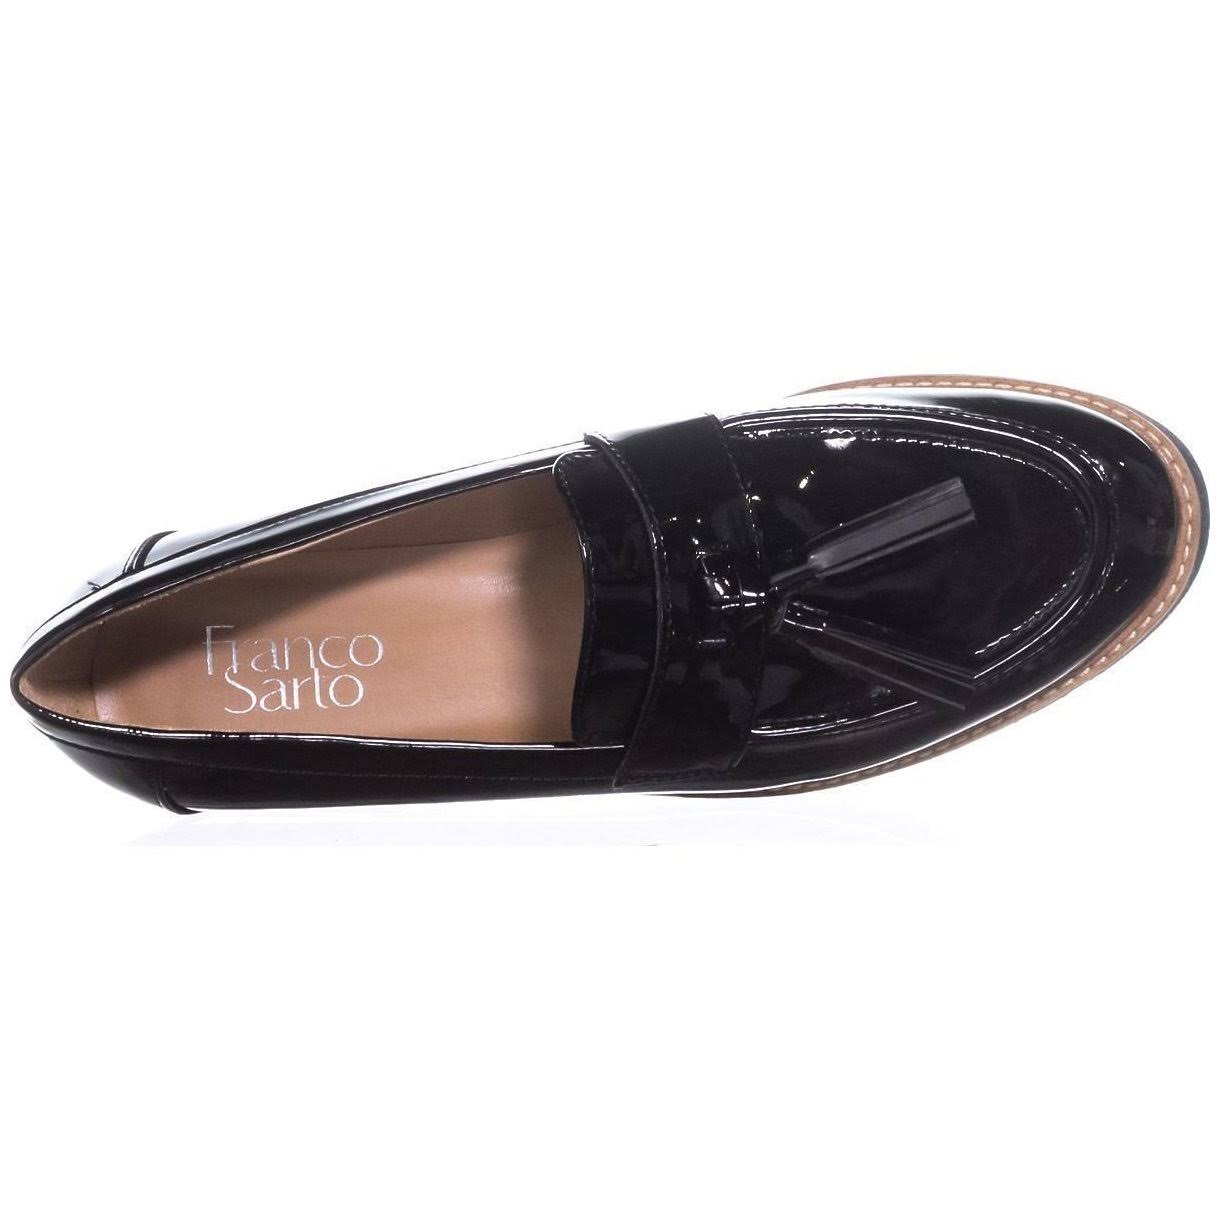 Women's FlatBlackSize Loafer Carolynn 5 Franco Sarto 7 pLSzGqMVU